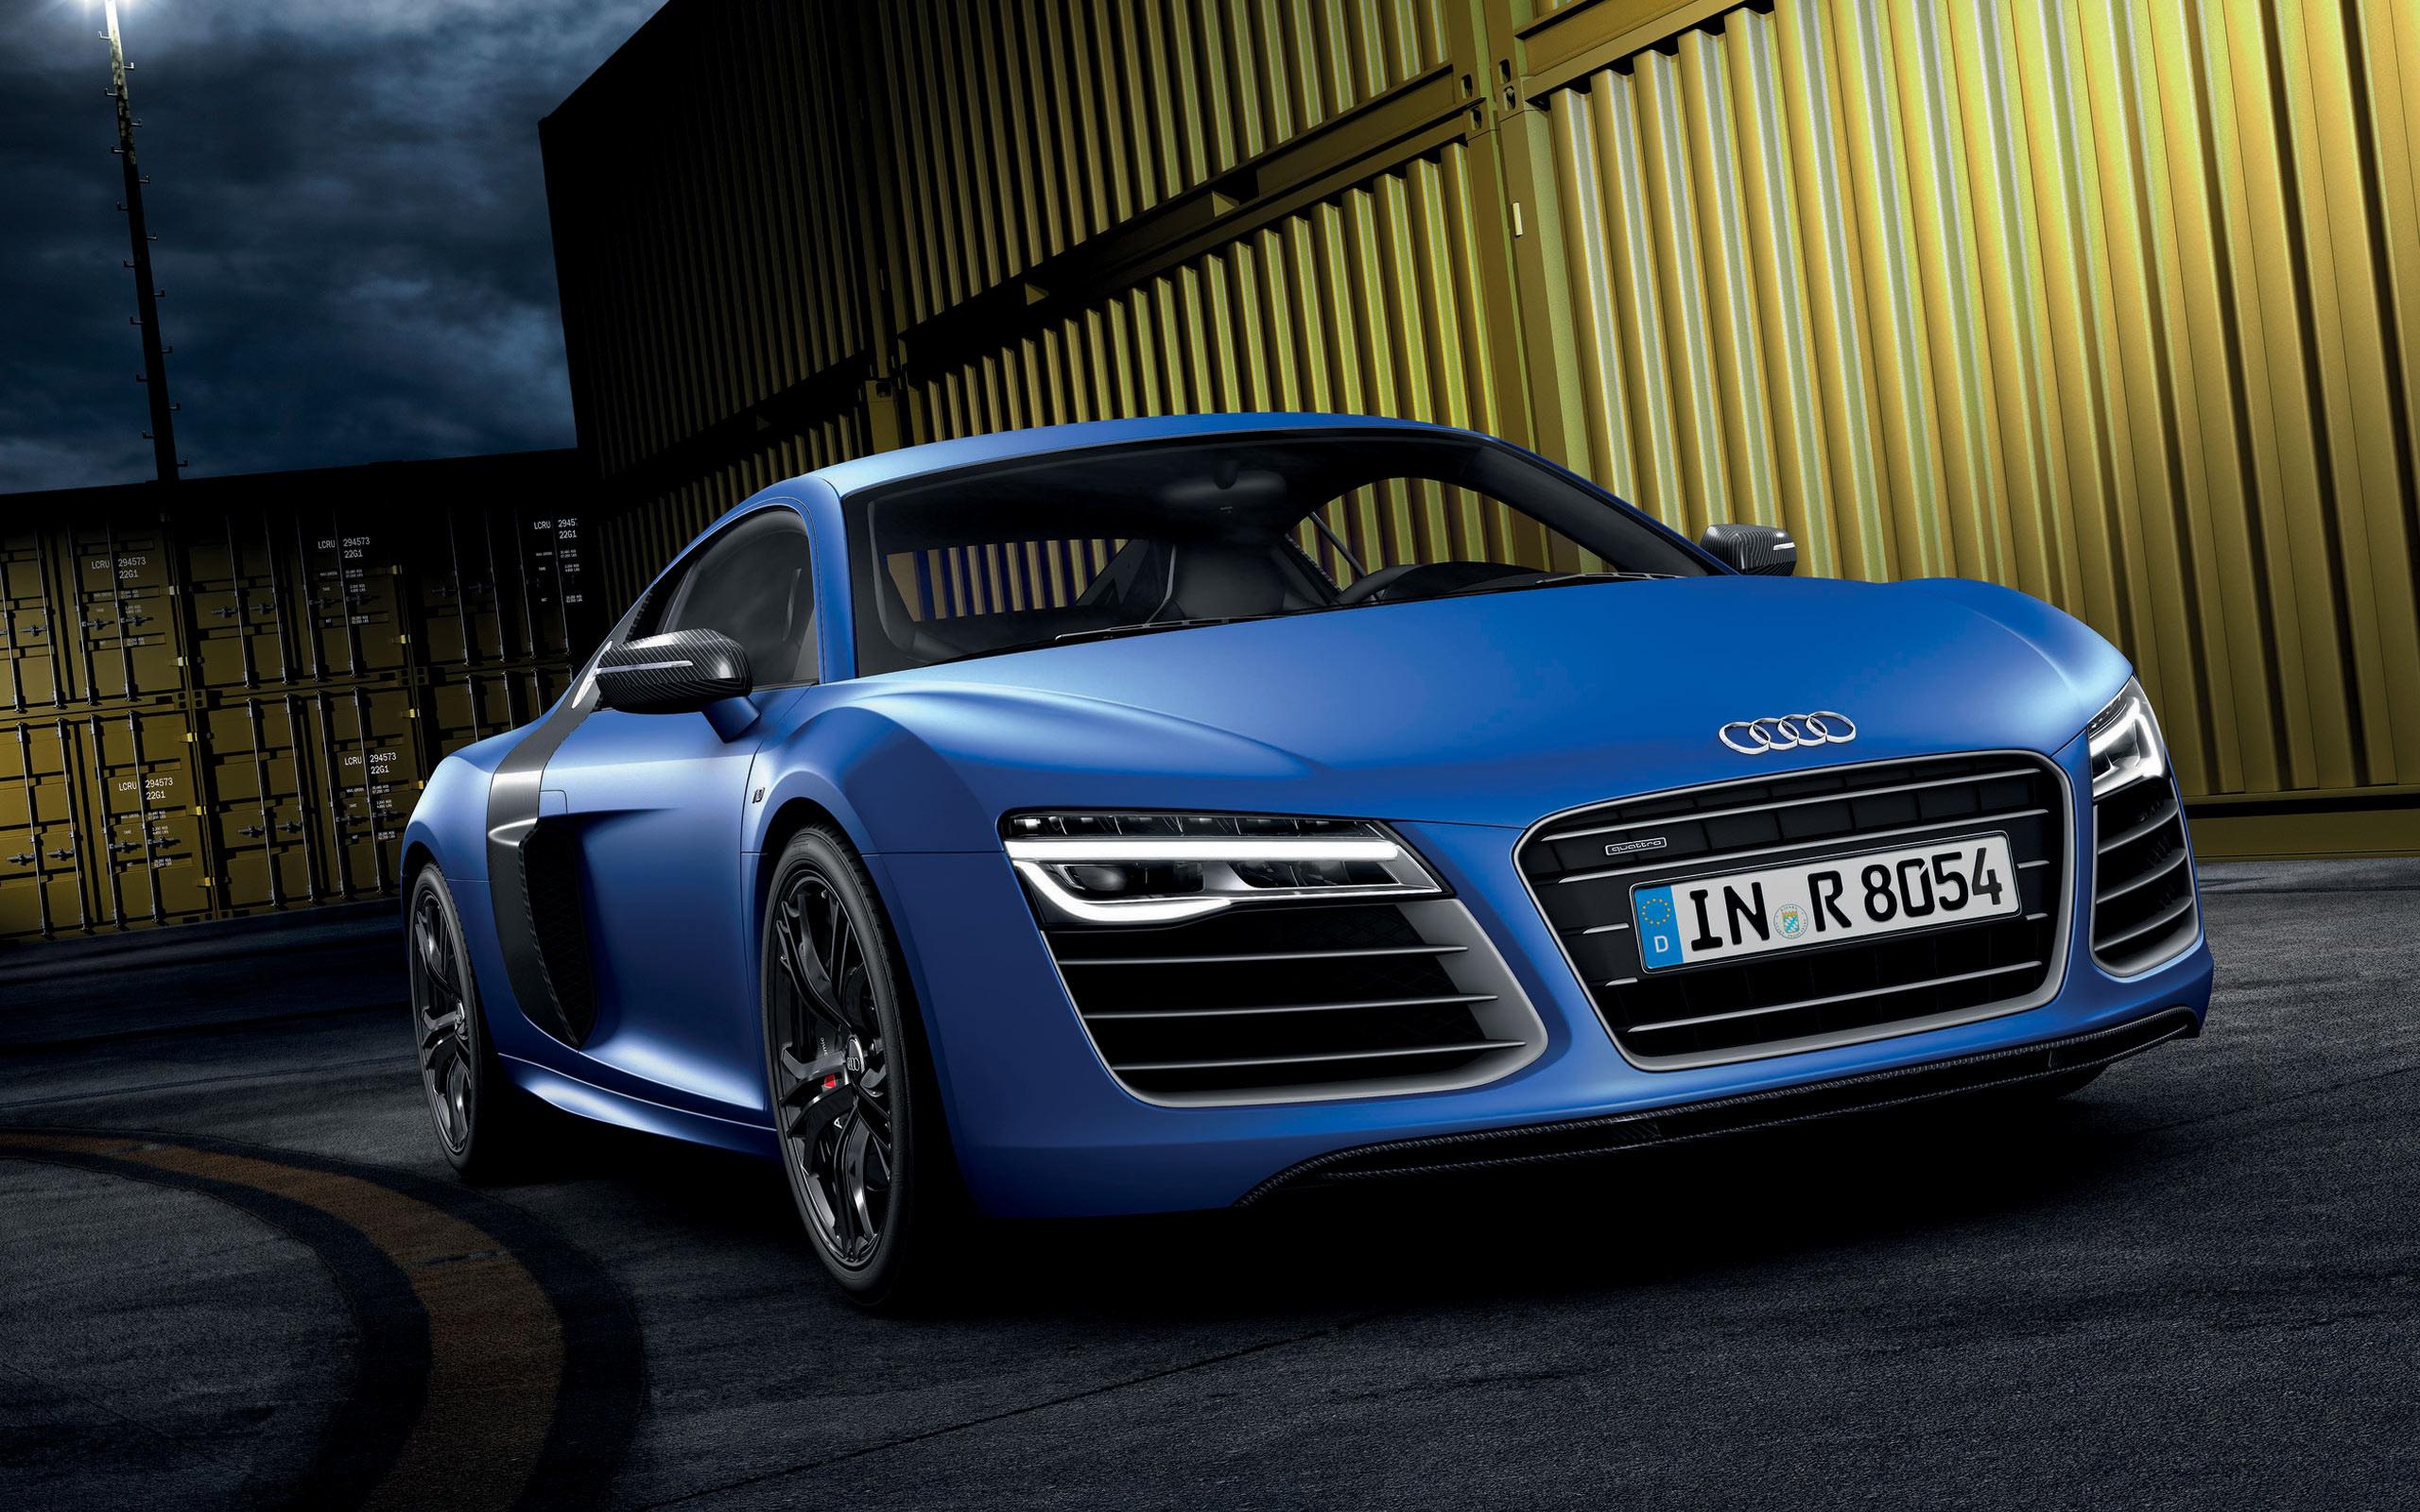 2013 Audi R8 V10 Plus Wallpaper HD Car Wallpapers 2560x1600